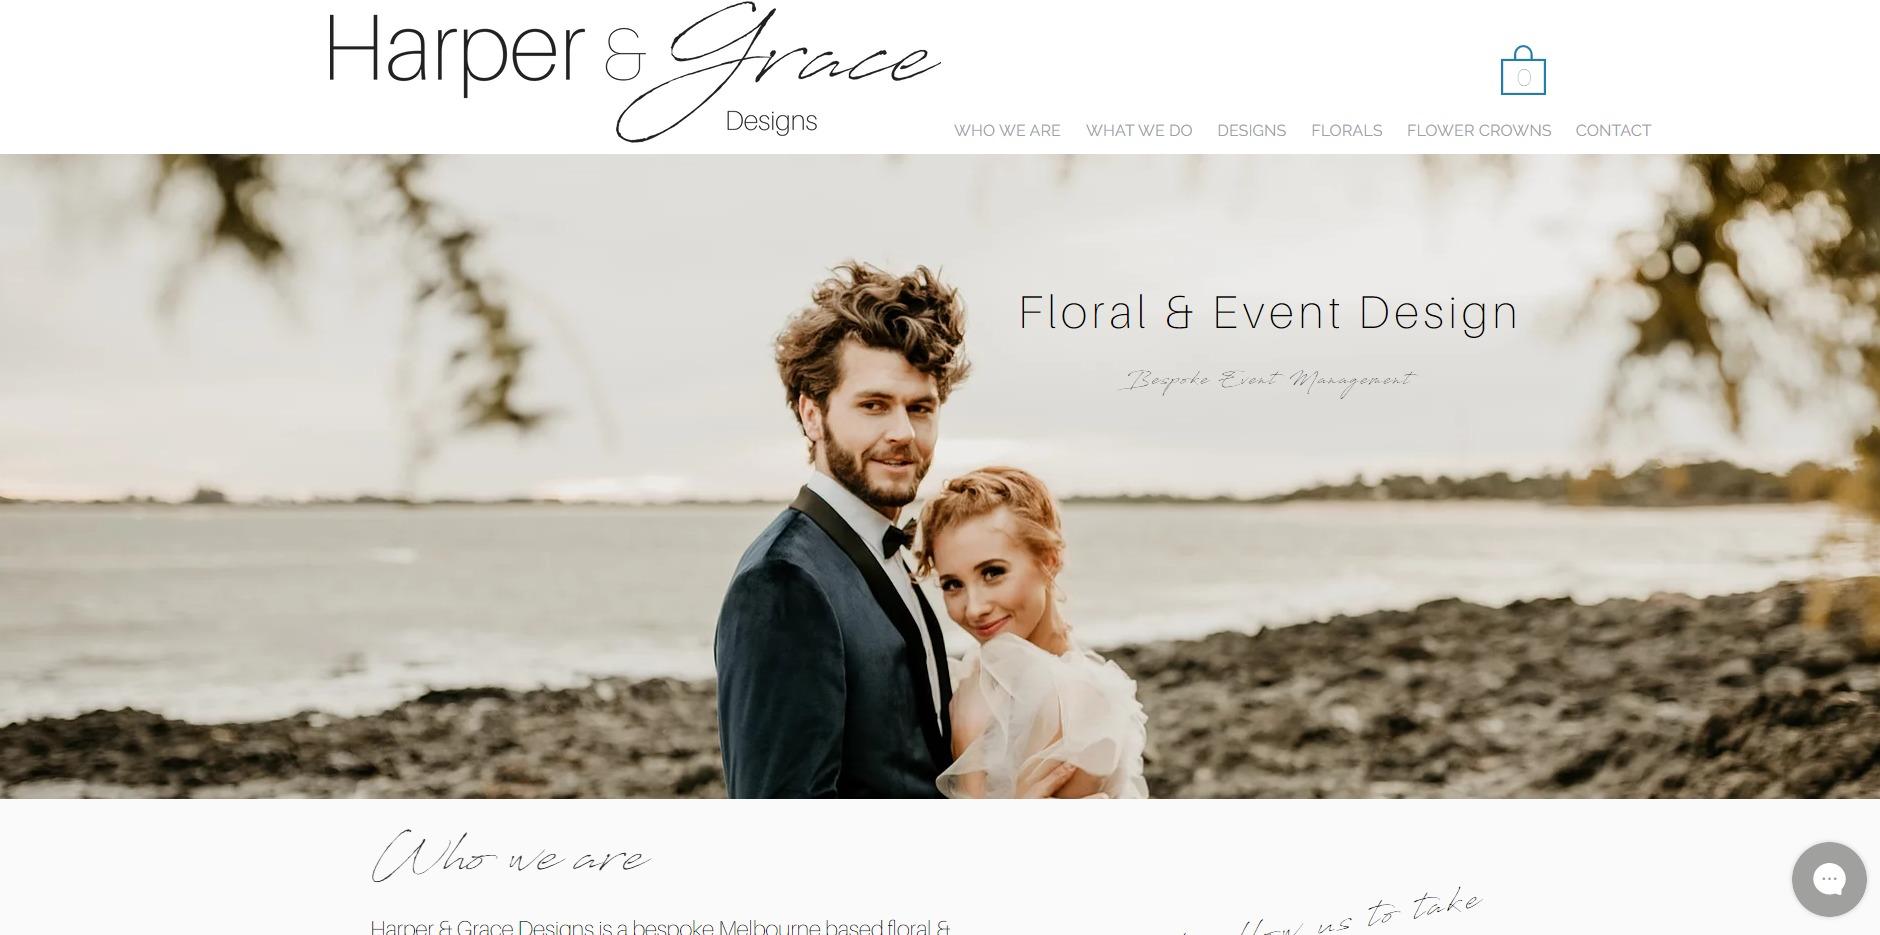 Harper & Grace Designs